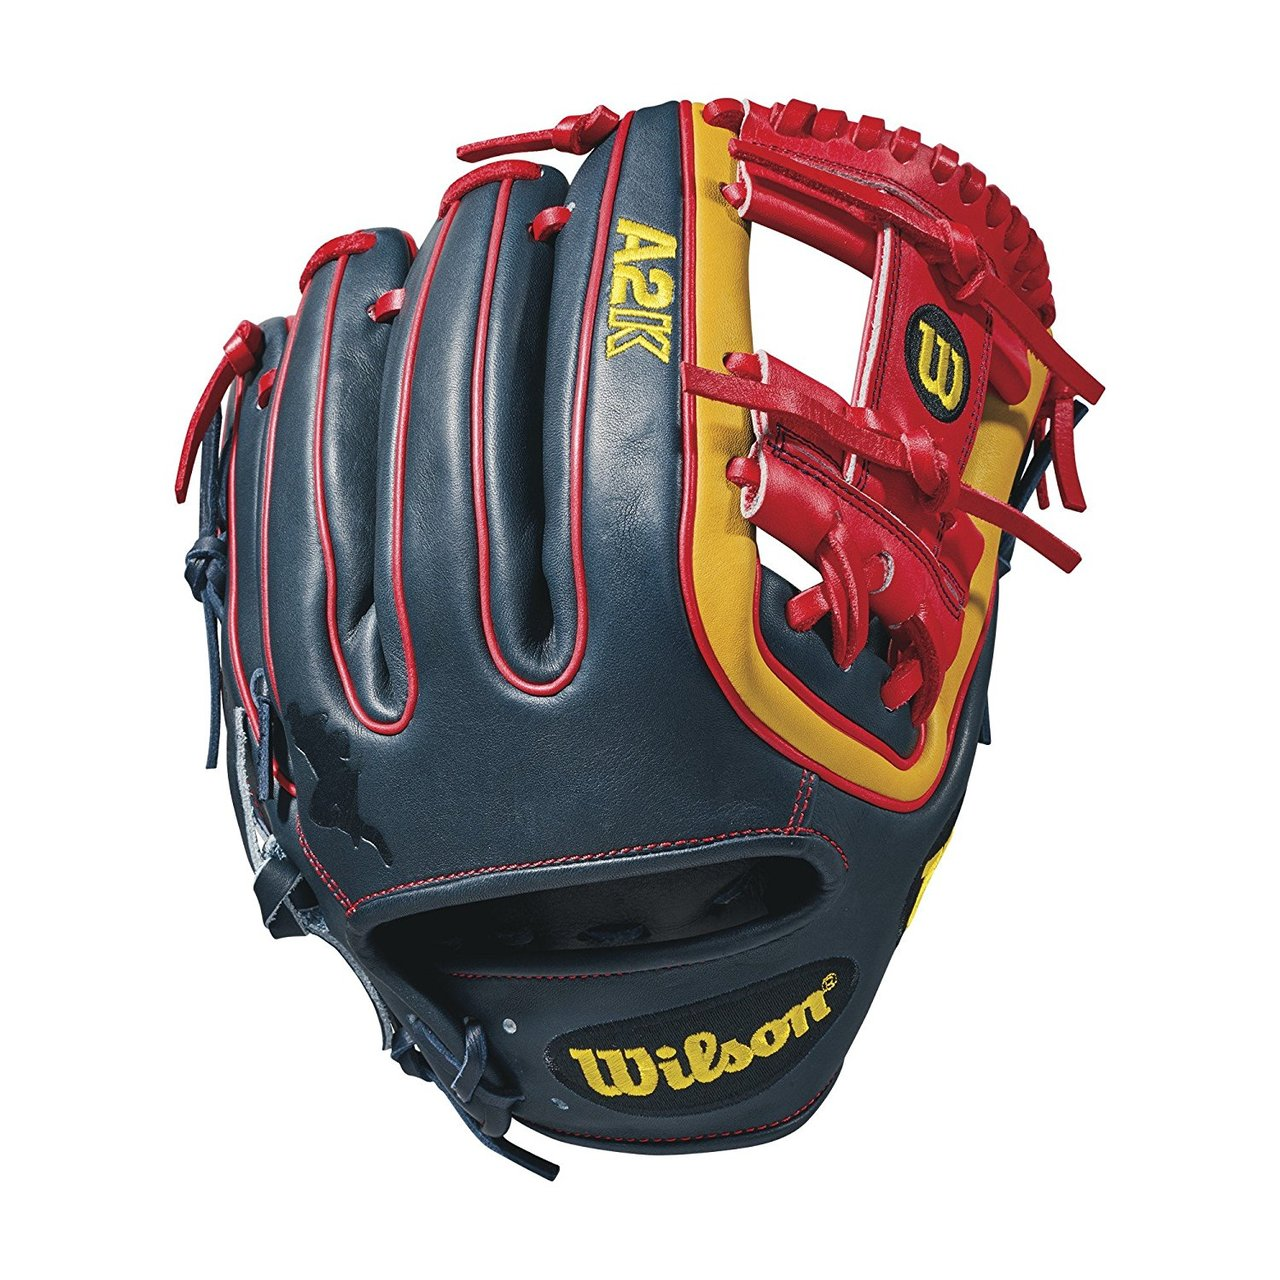 wilson-2018-a2k-datdude-gm-baseball-glove-right-hand-throw-11-5-inch.jpg